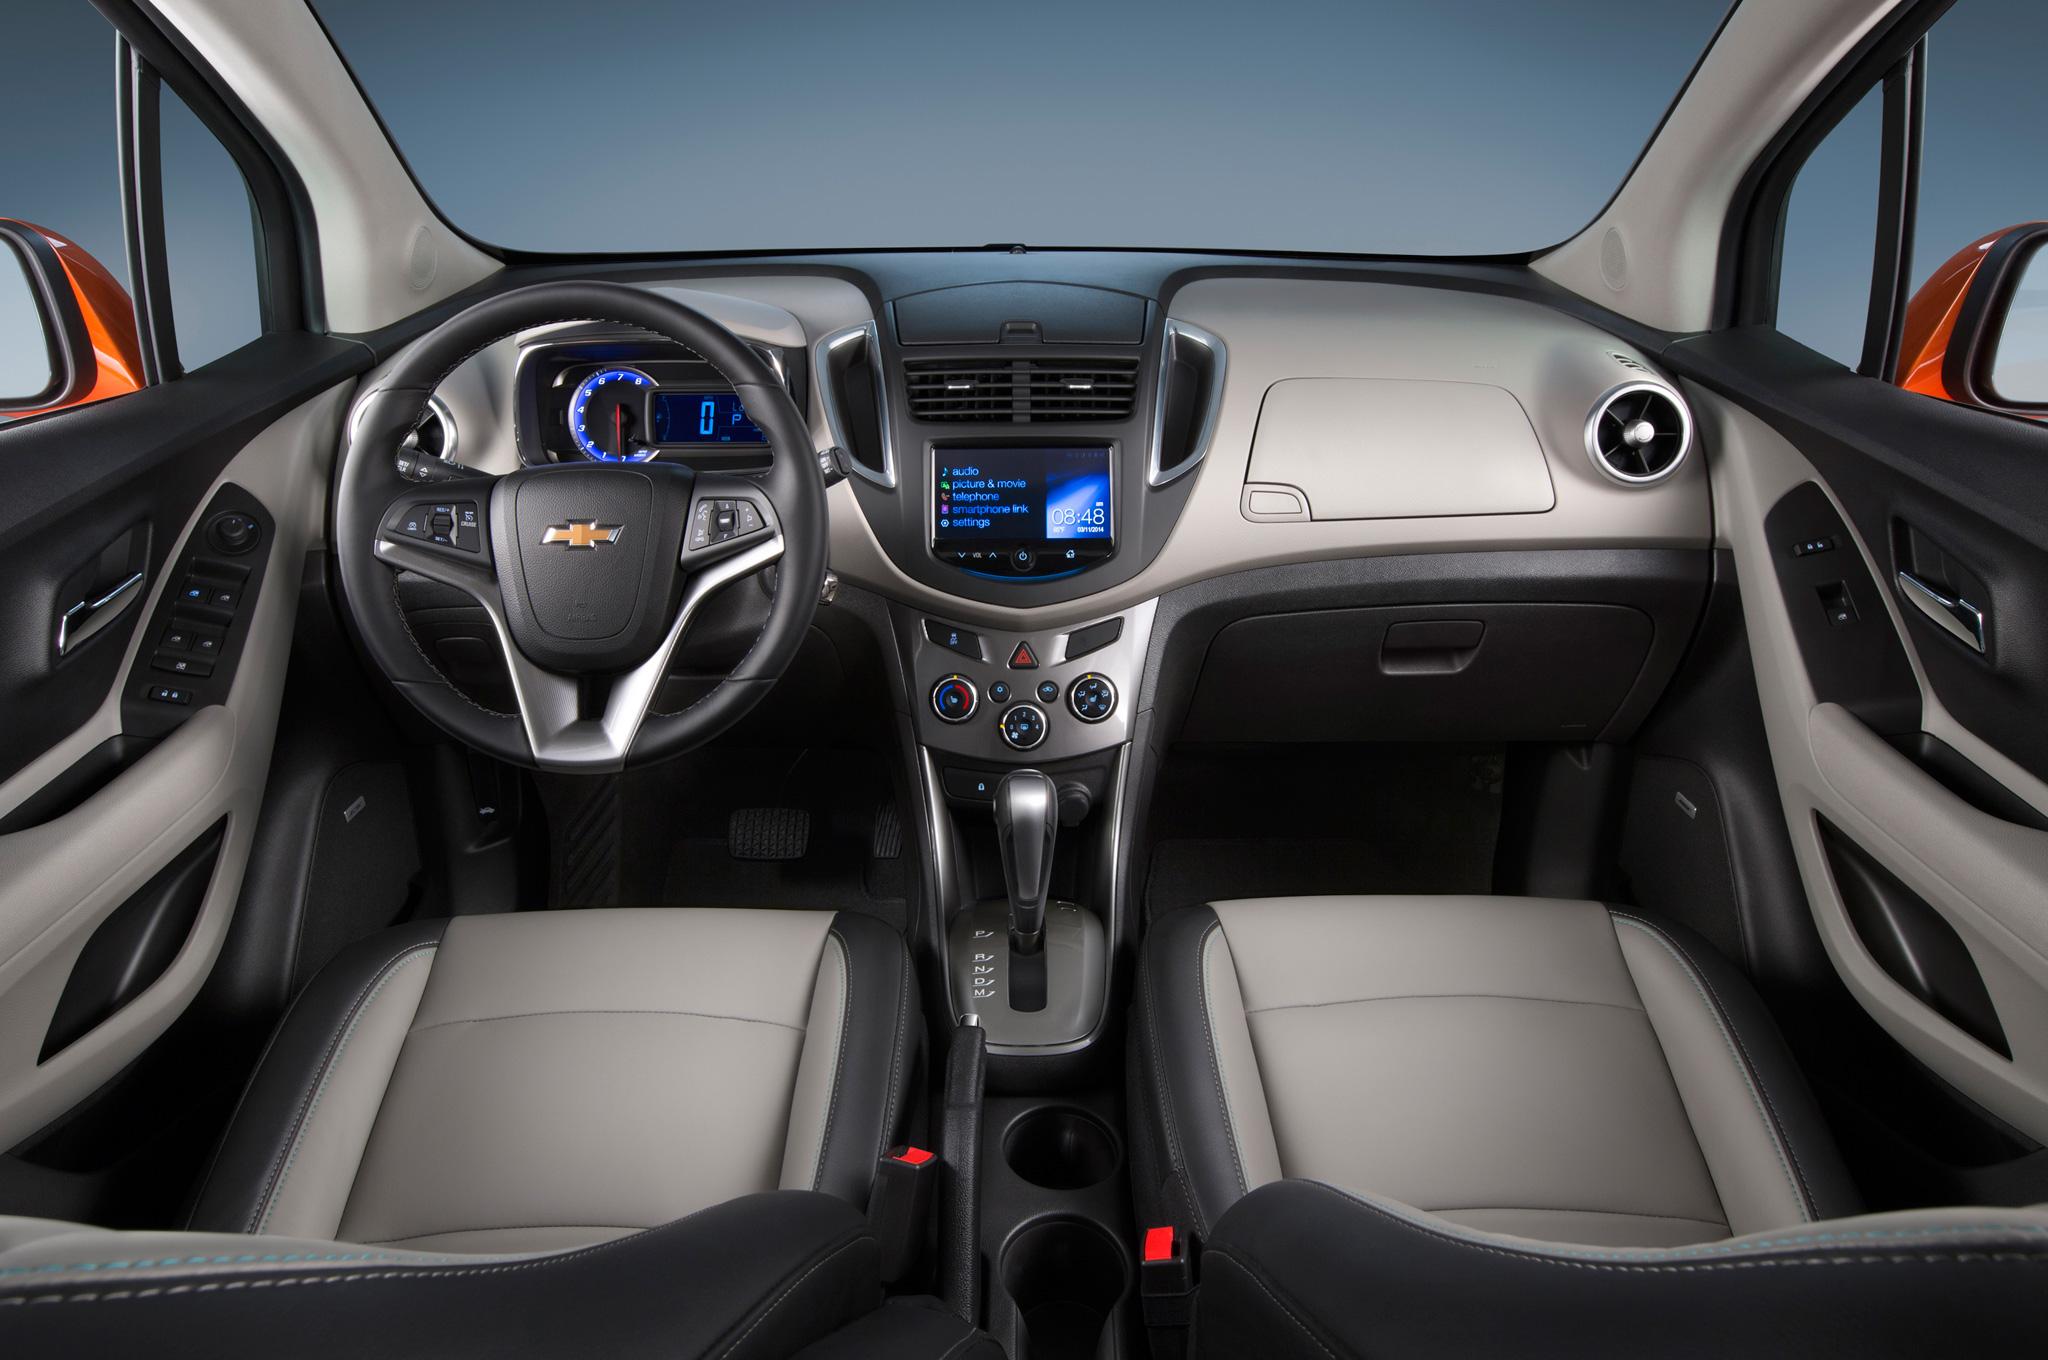 2015 Chevrolet Trax Cockpit and Dashboard Interior